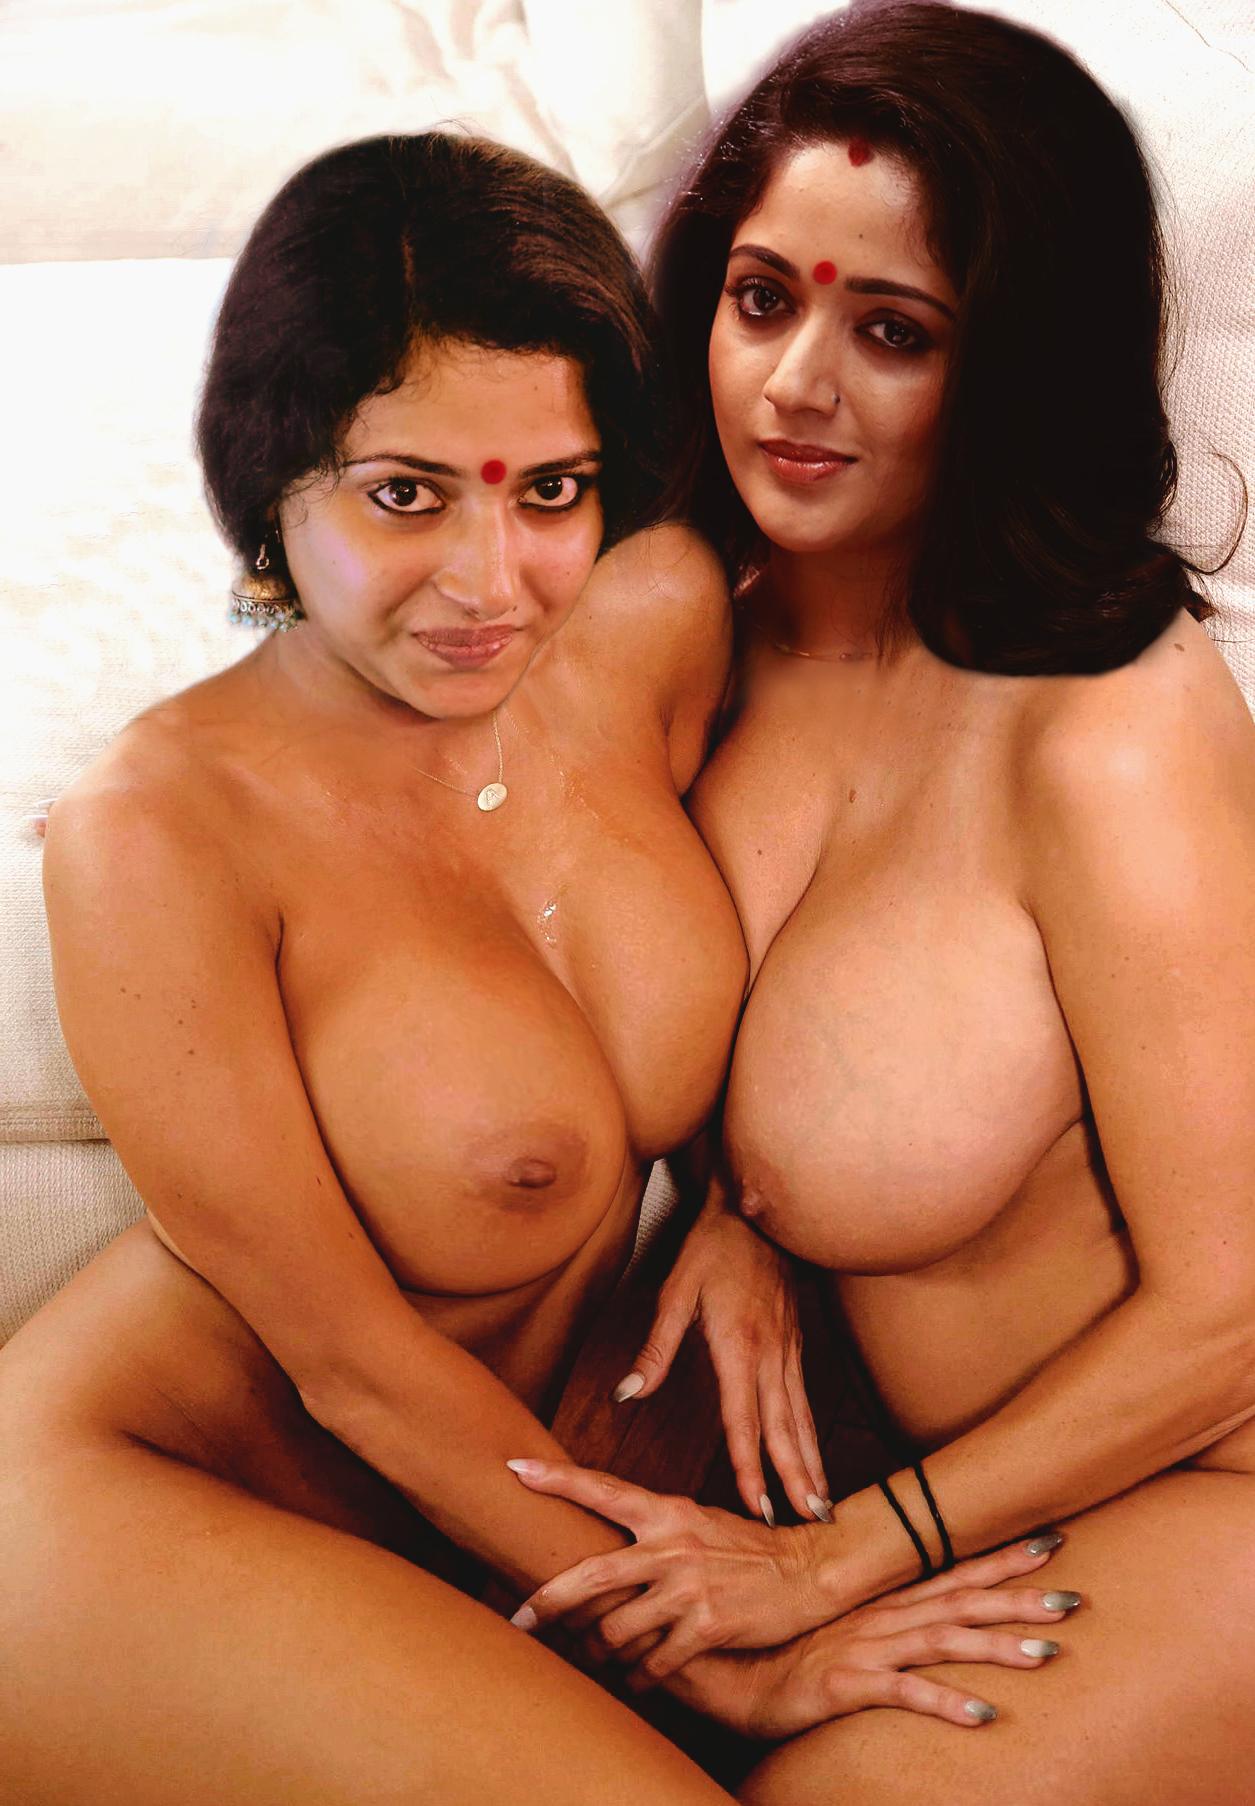 Malayalam girl actress nude image